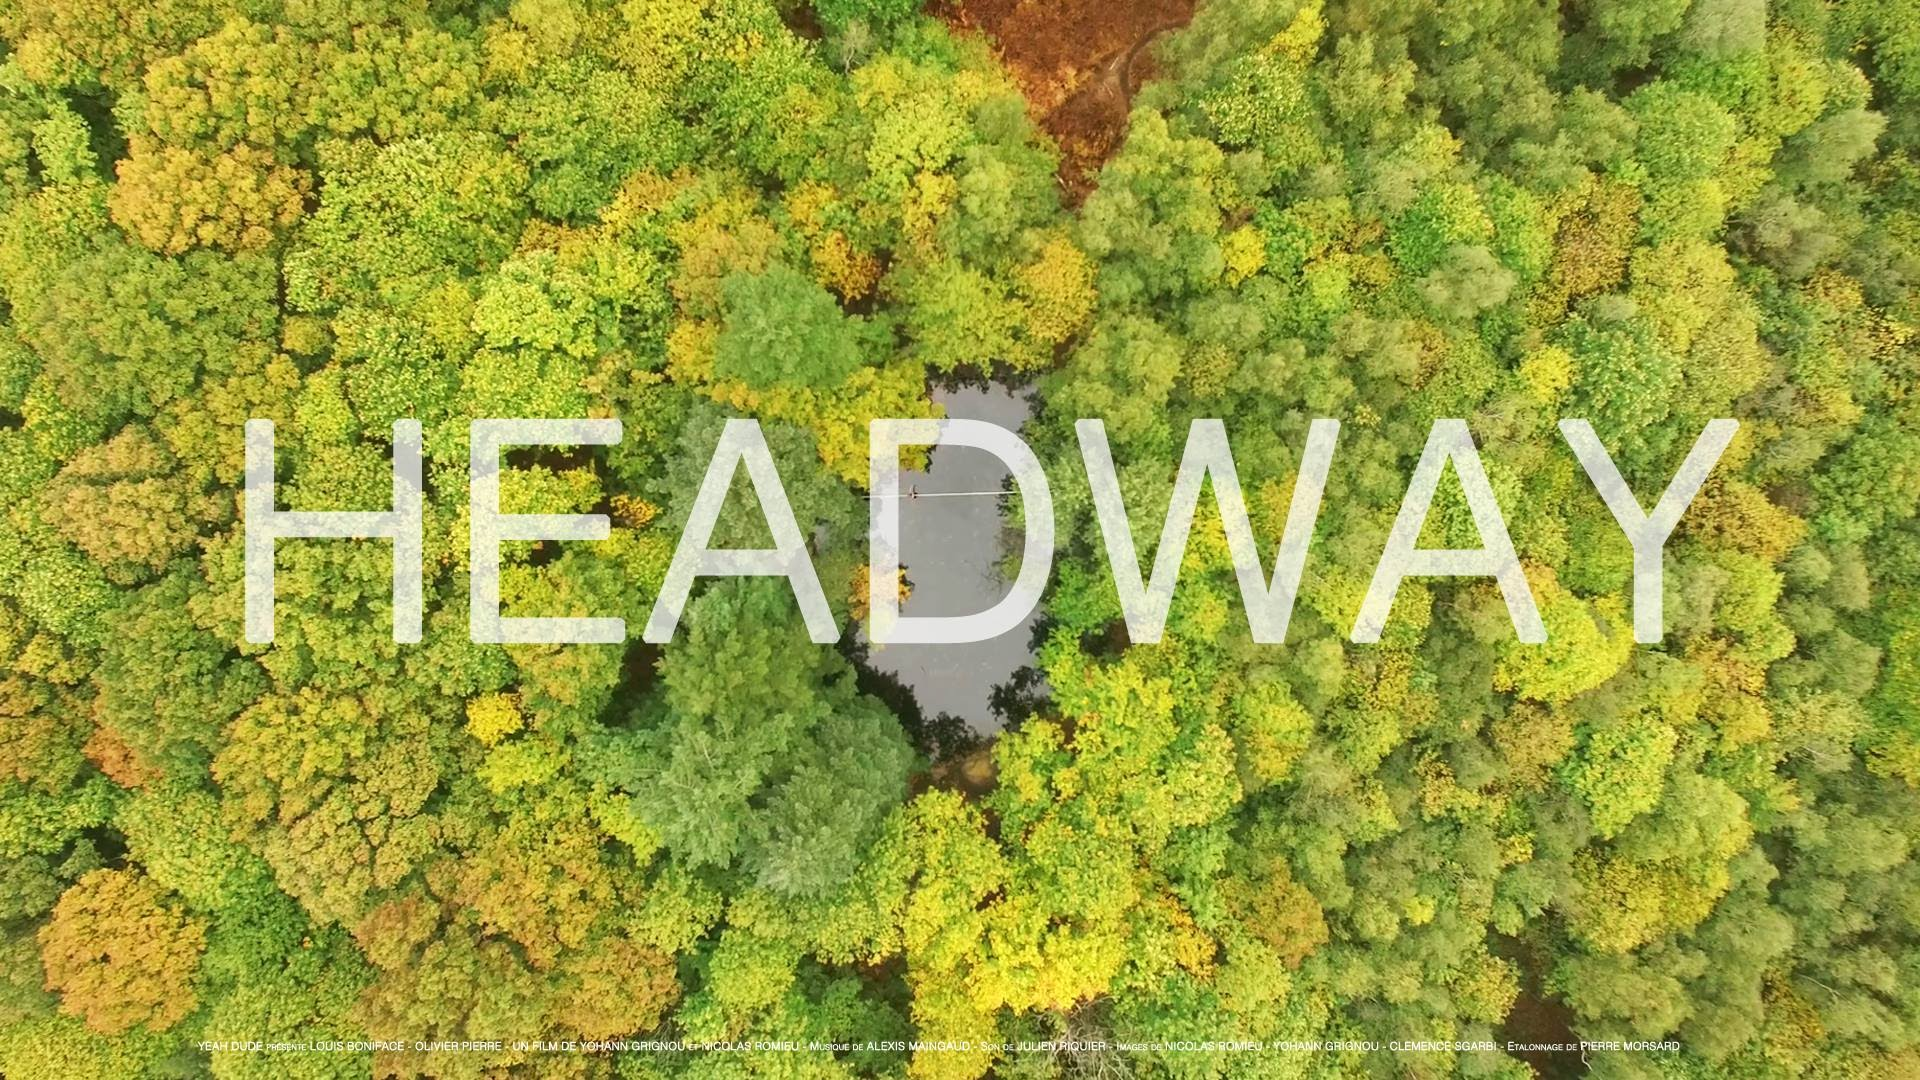 Headway 1